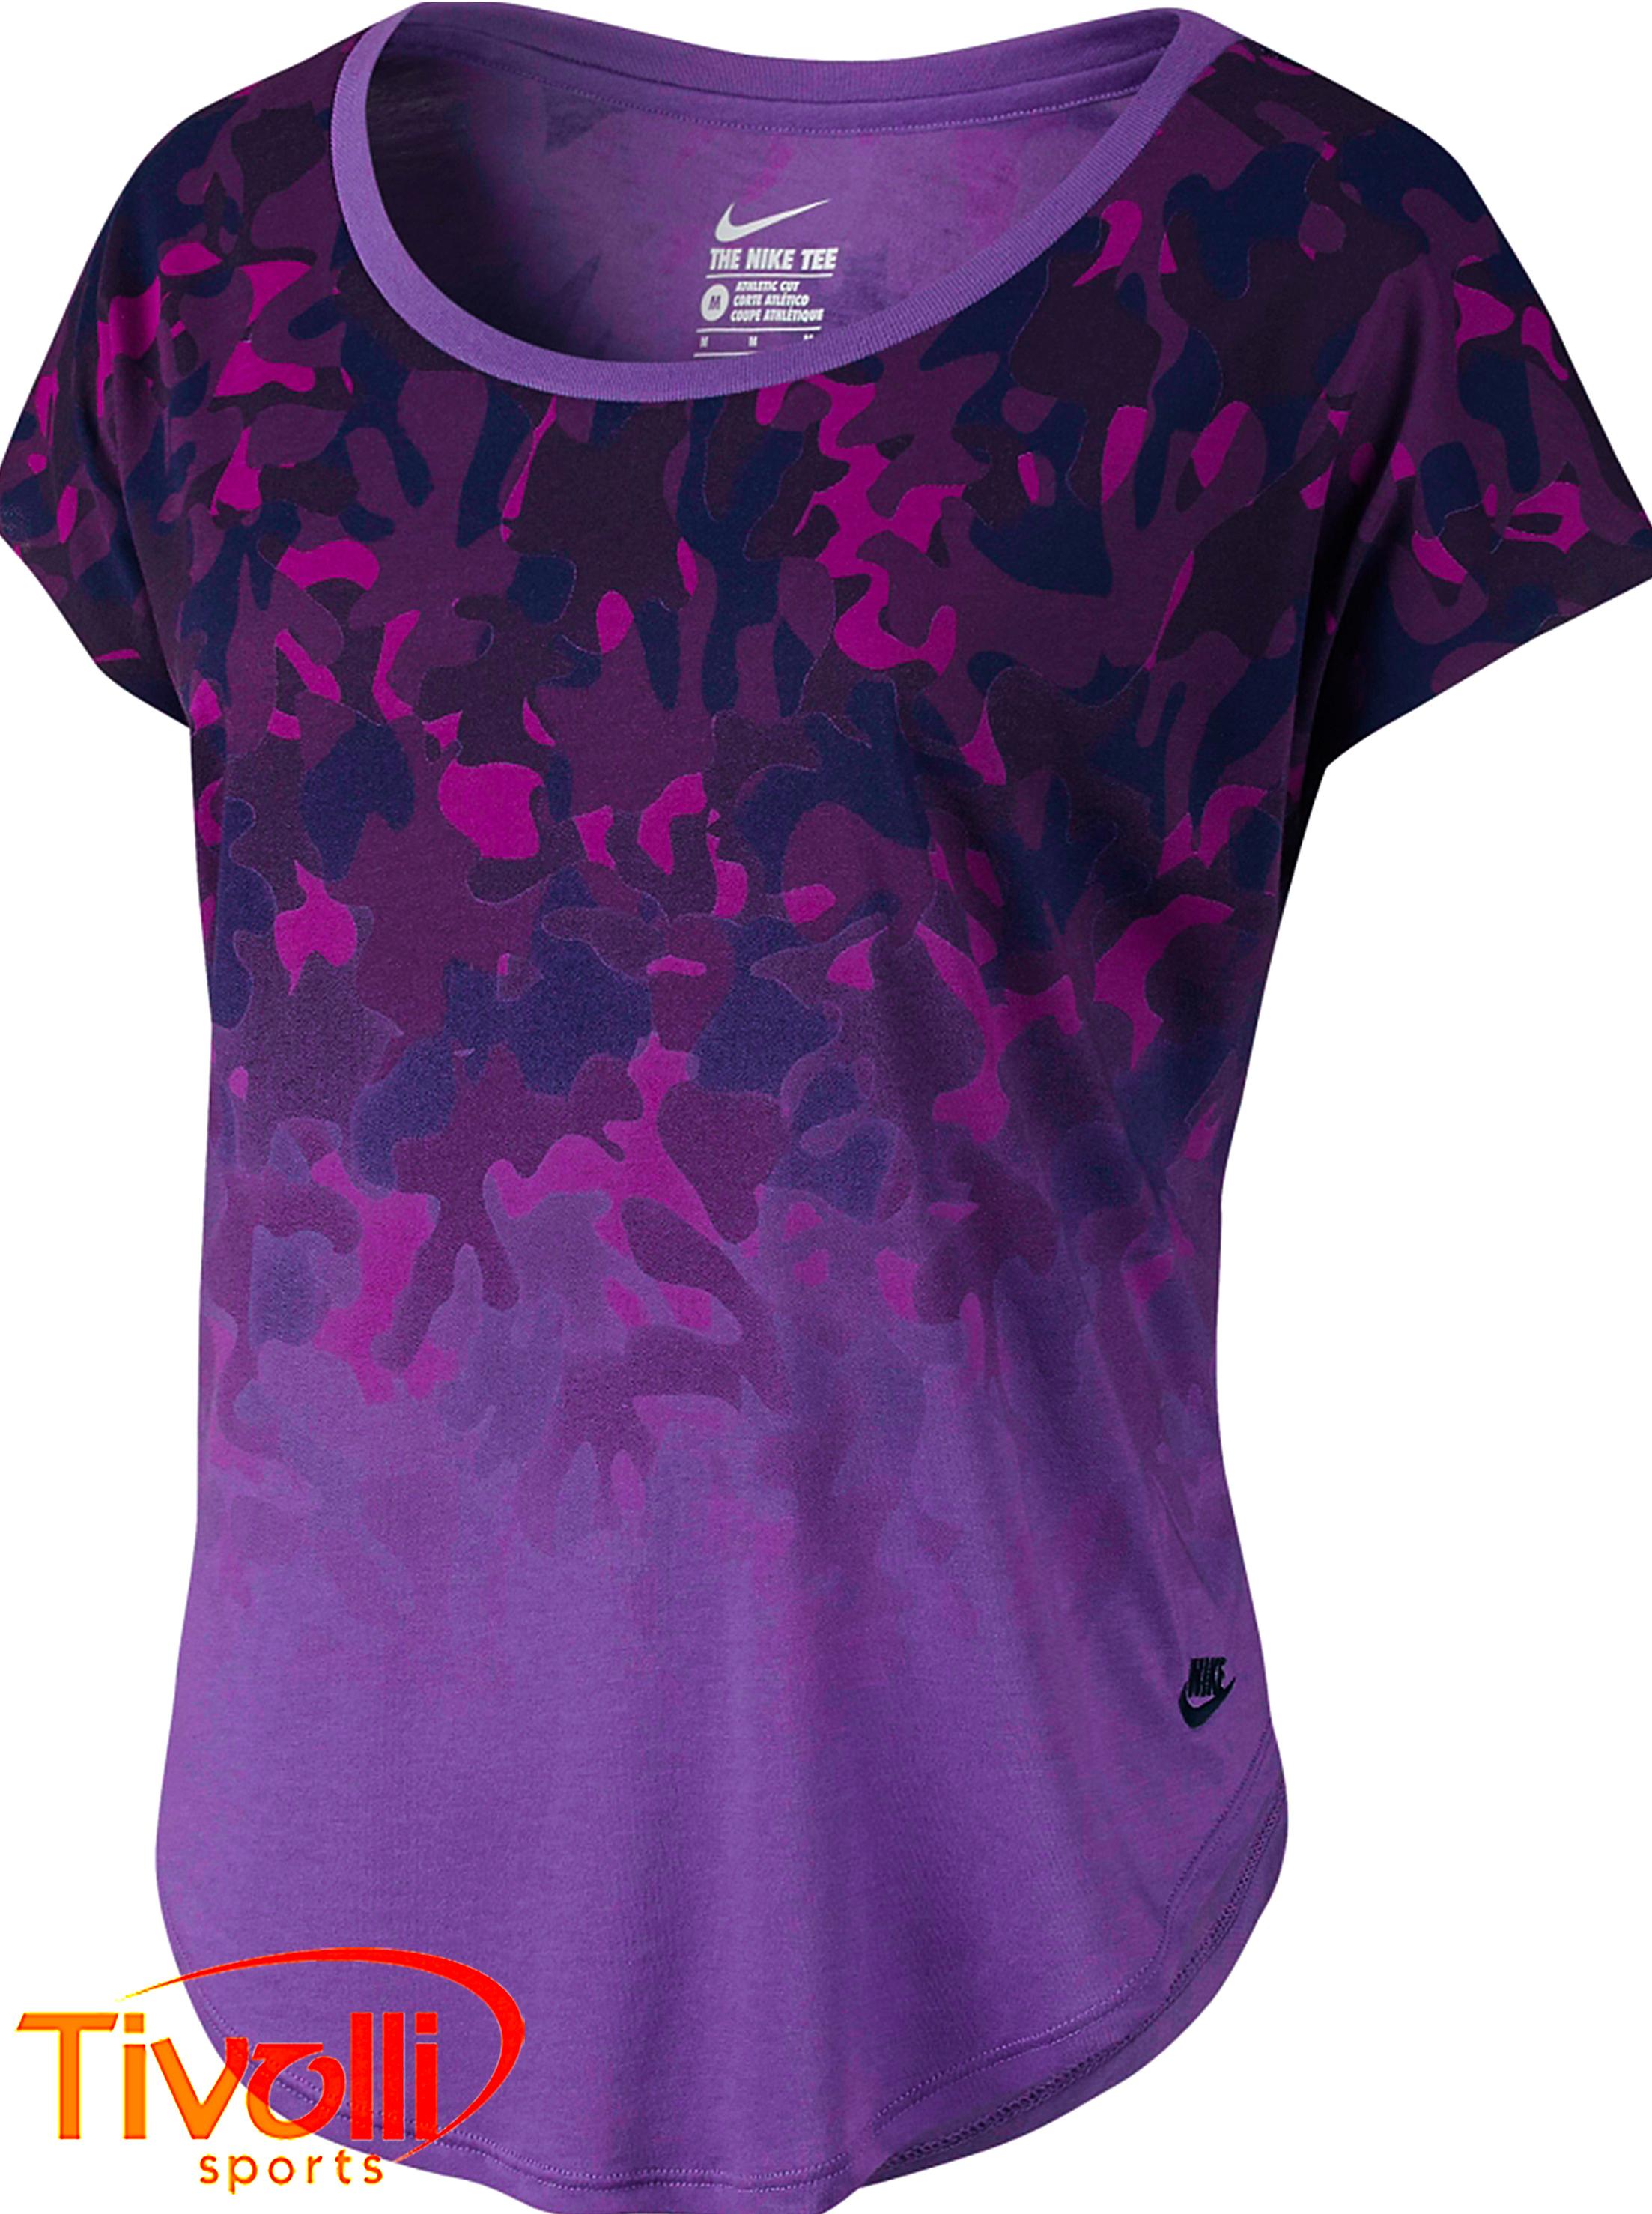 aa0d83ef25384 Raquete Mania   Camiseta Nike feminina   Signal Dip-Dye Camo roxa ...